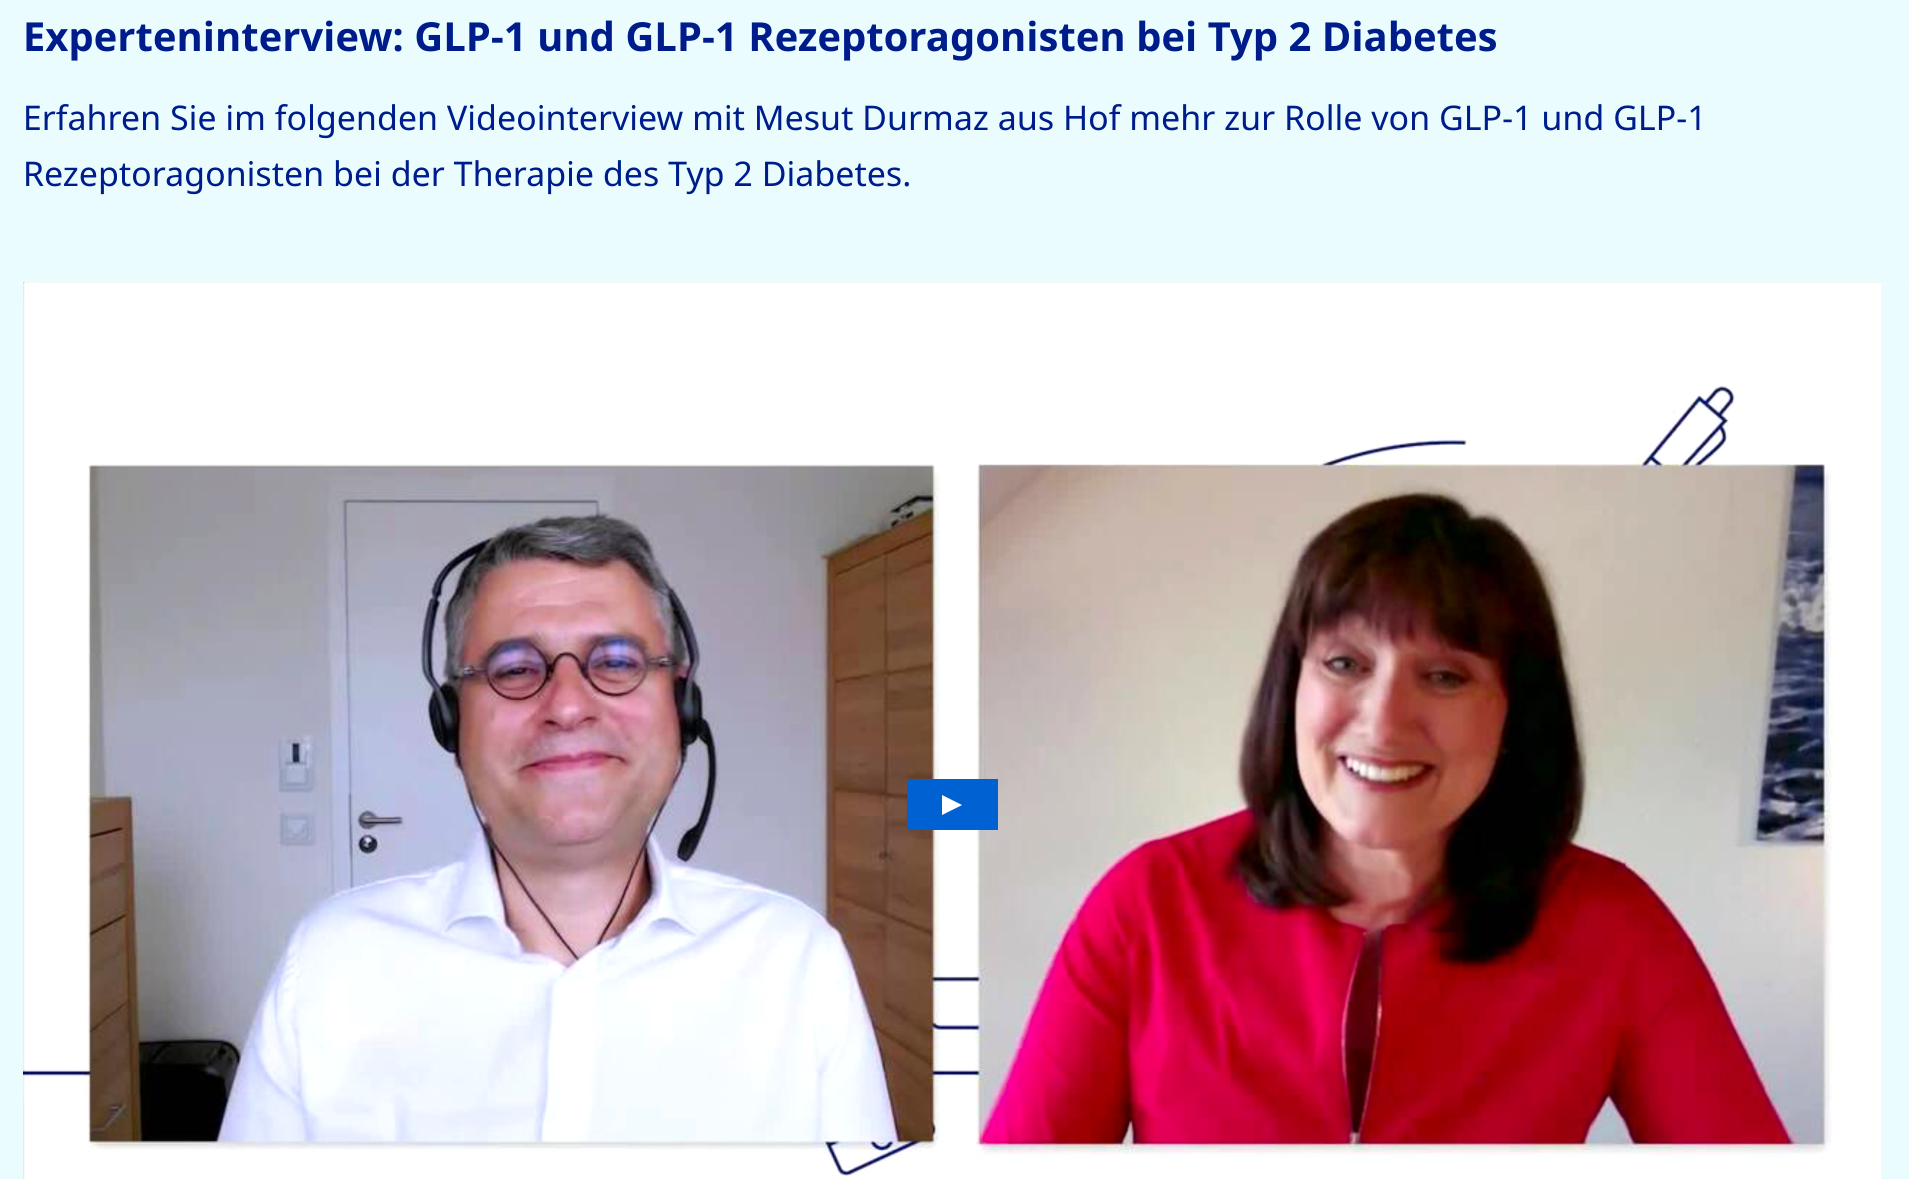 Videopodcast Experteninterview Typ 2 Diabetes